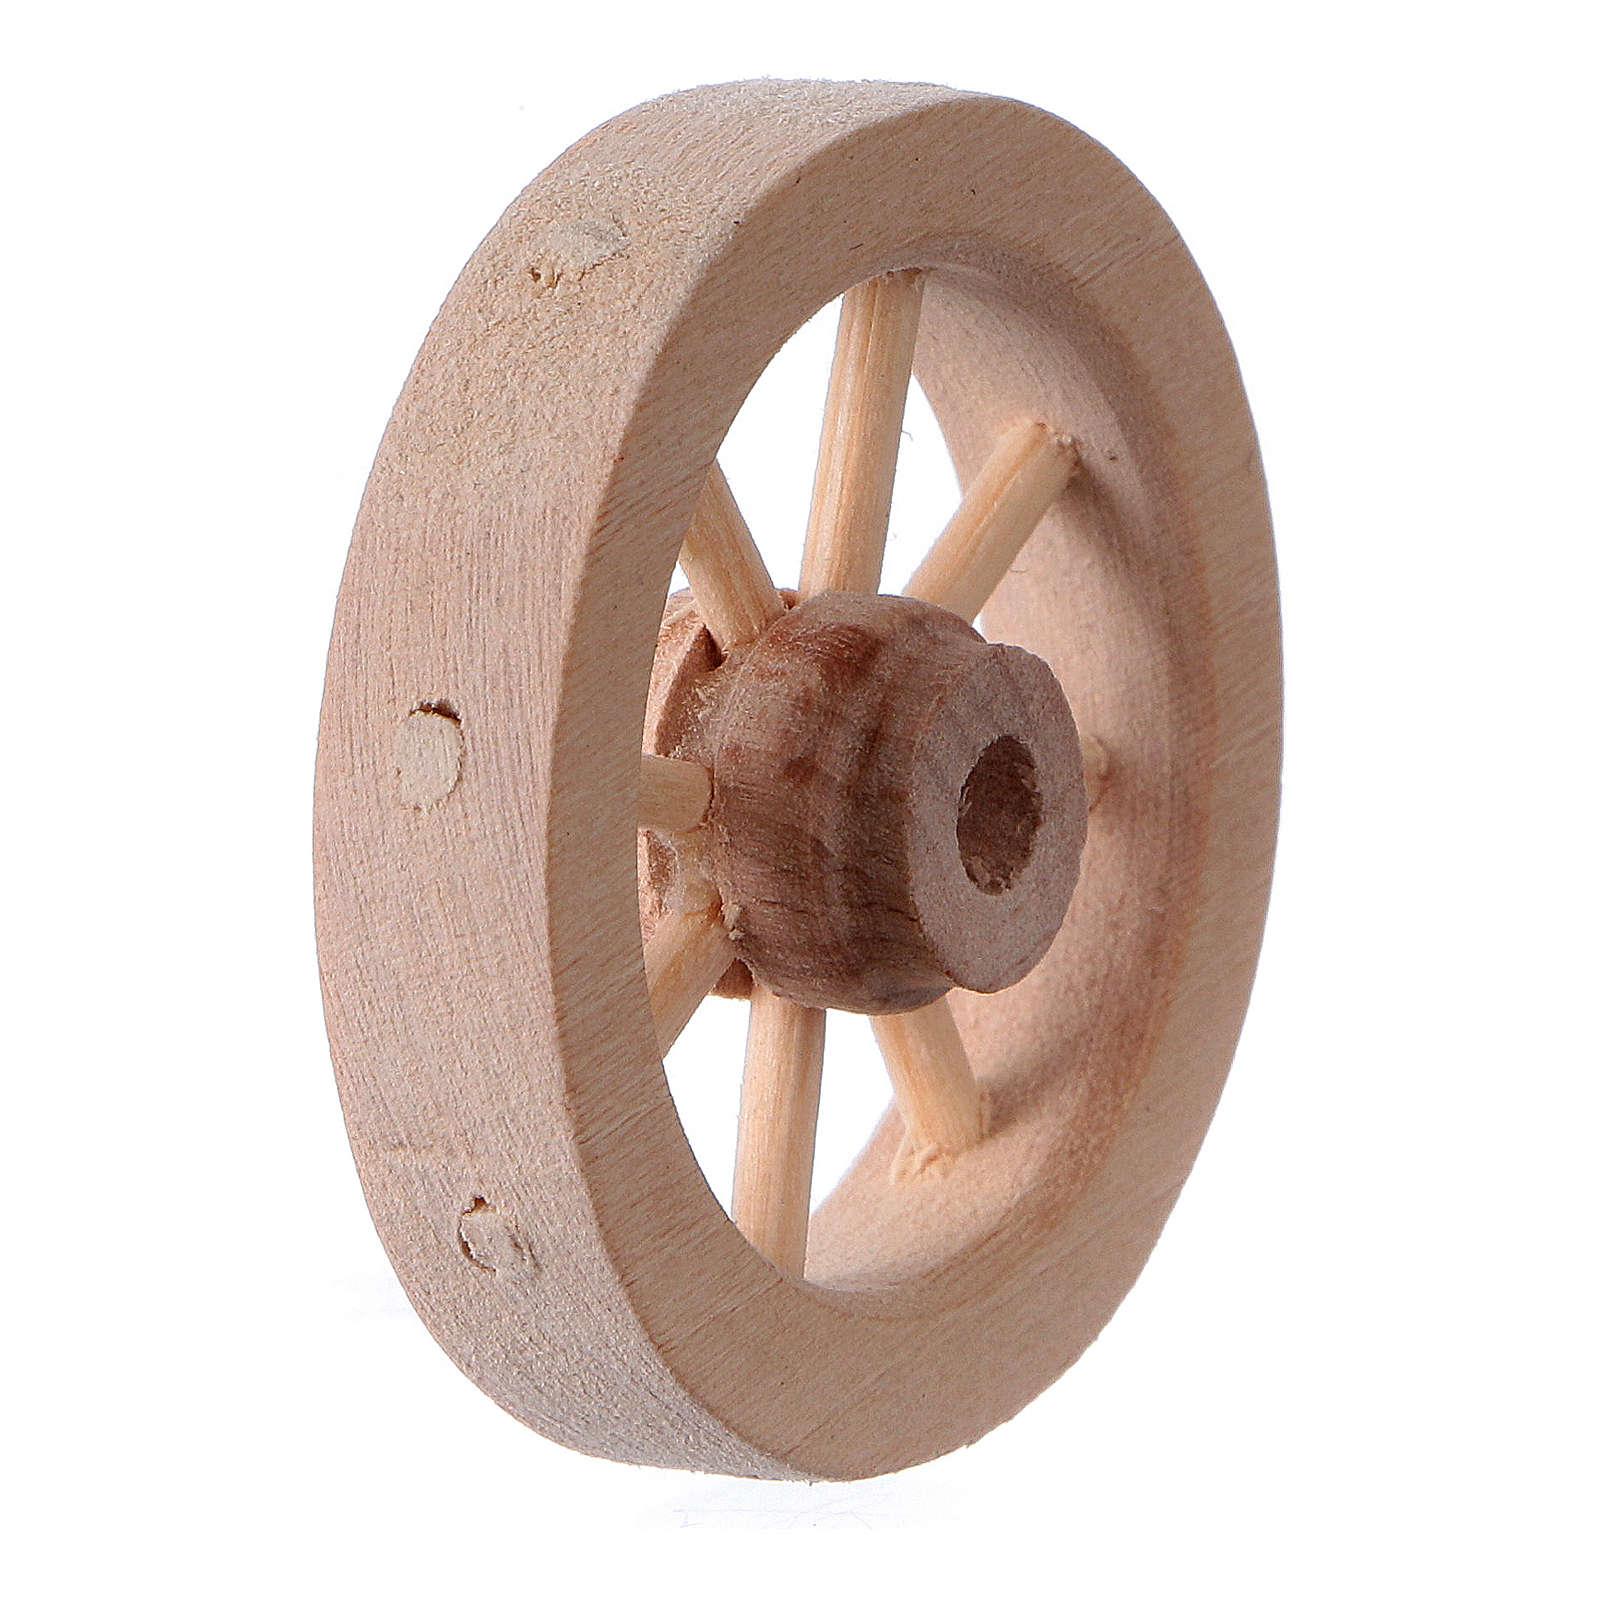 Carriage wheel for Nativity scene in light wood diam. 3.5 cm 4